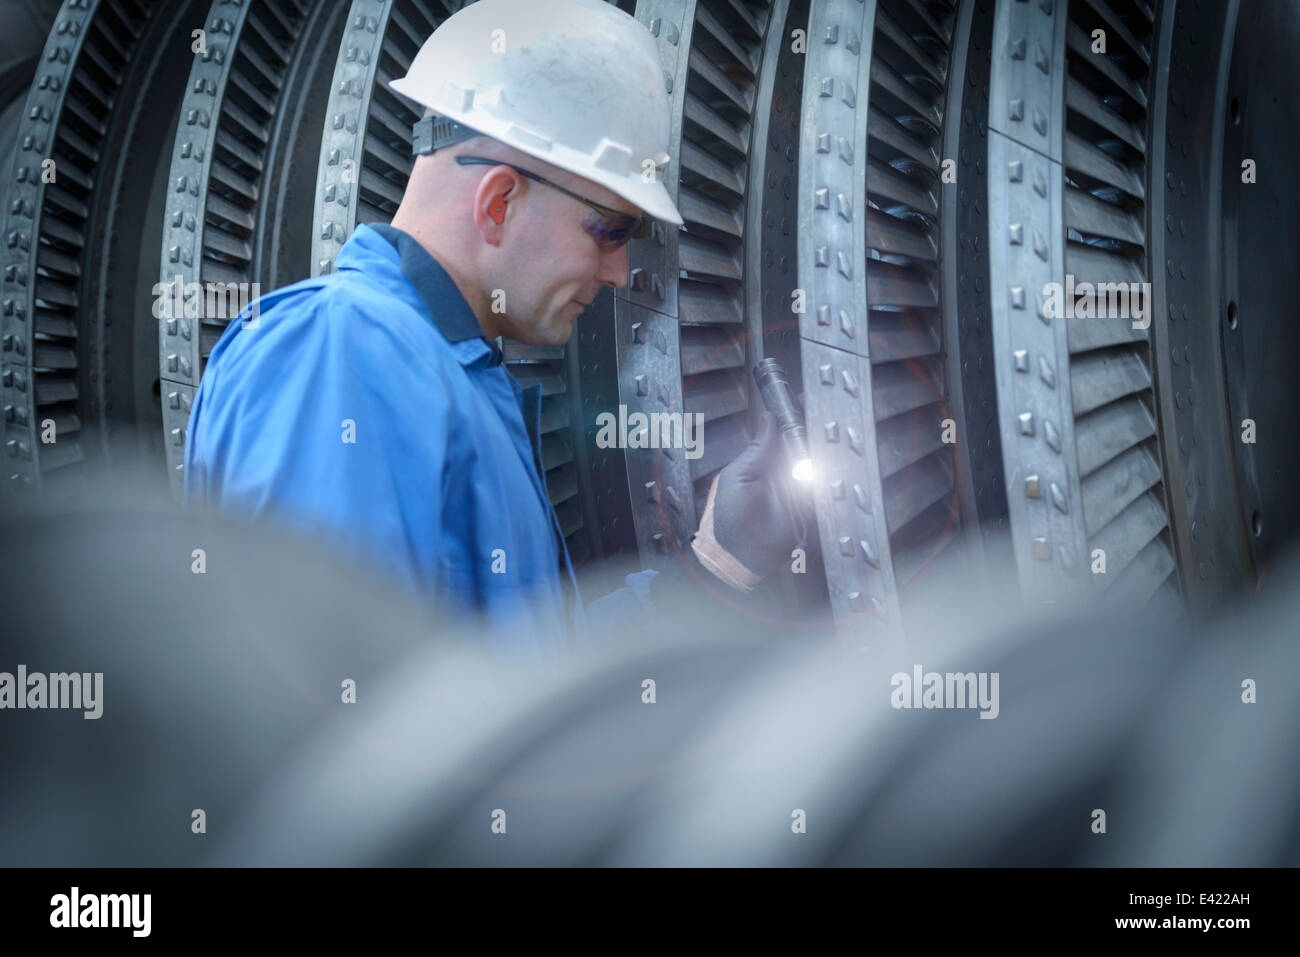 Ingenieur mit Fackel Inspektion Turbine im Kraftwerk Ausfall Stockbild